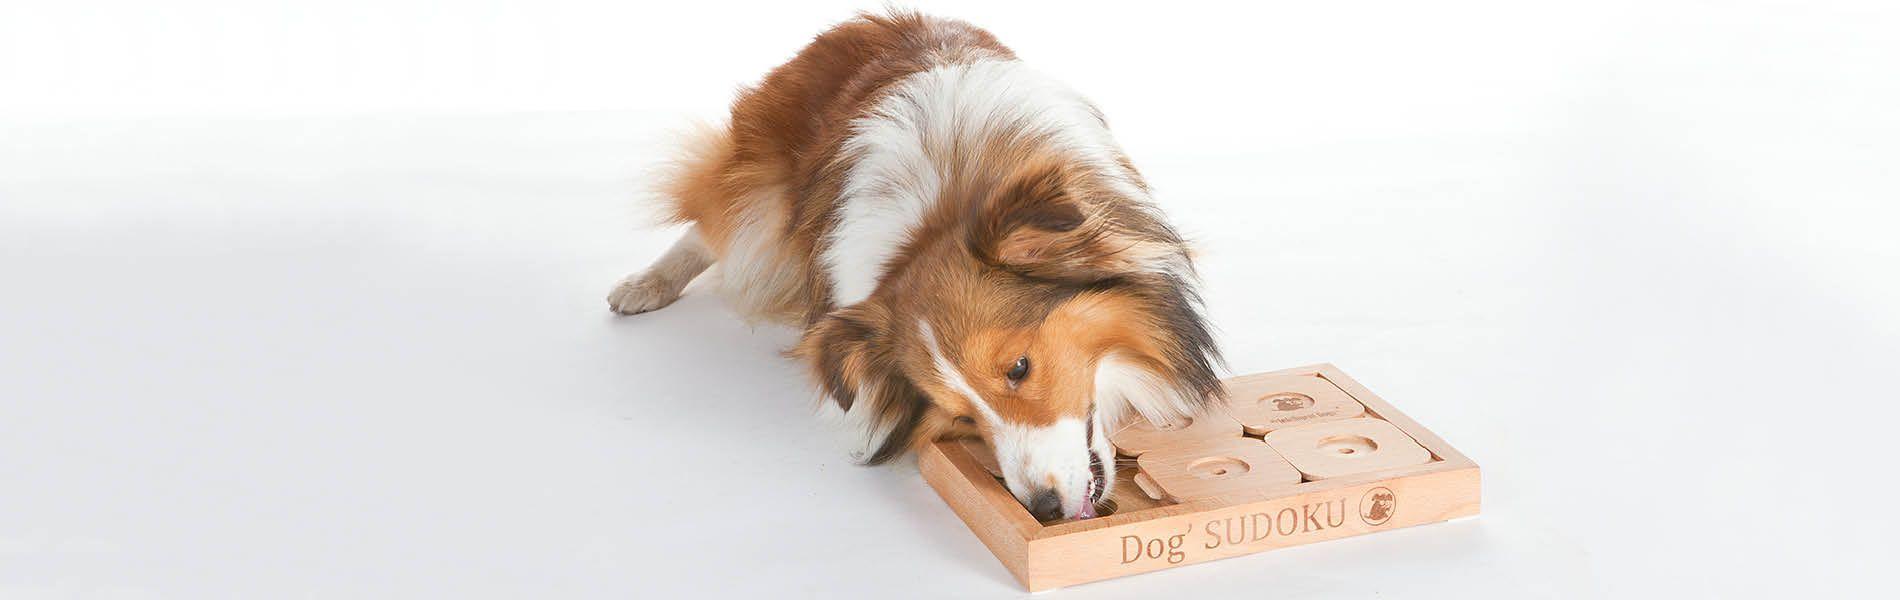 Hunde Intelligenz Liste